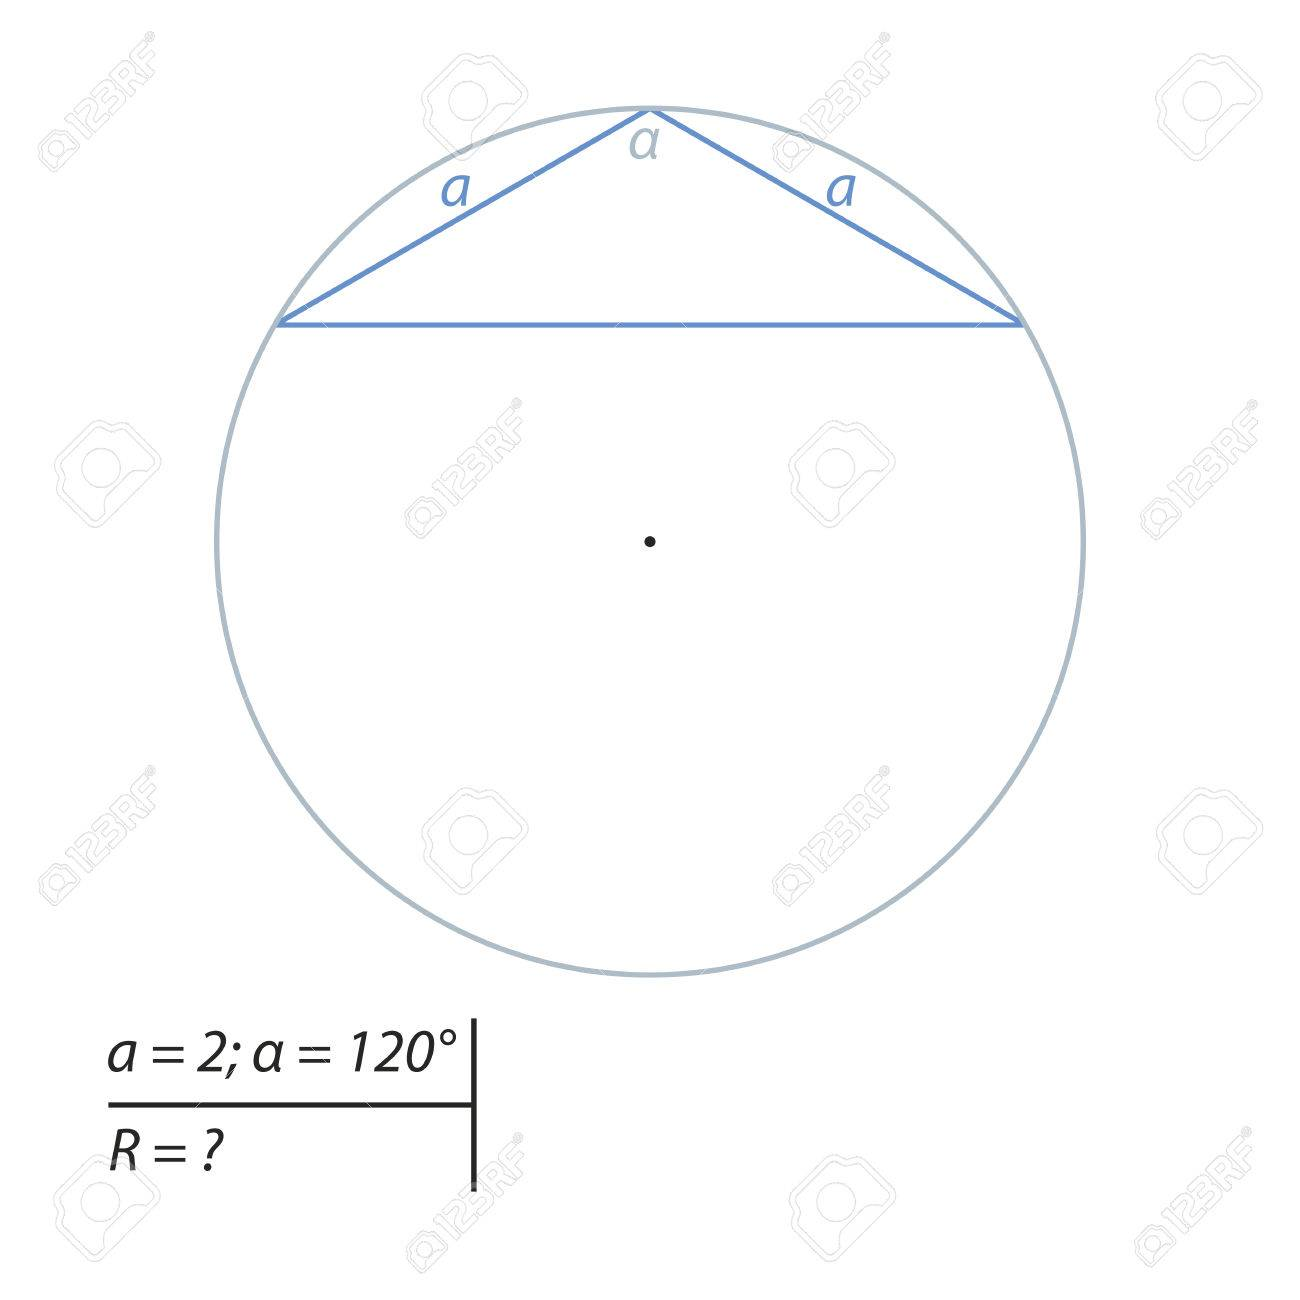 Radius kreis berechnen